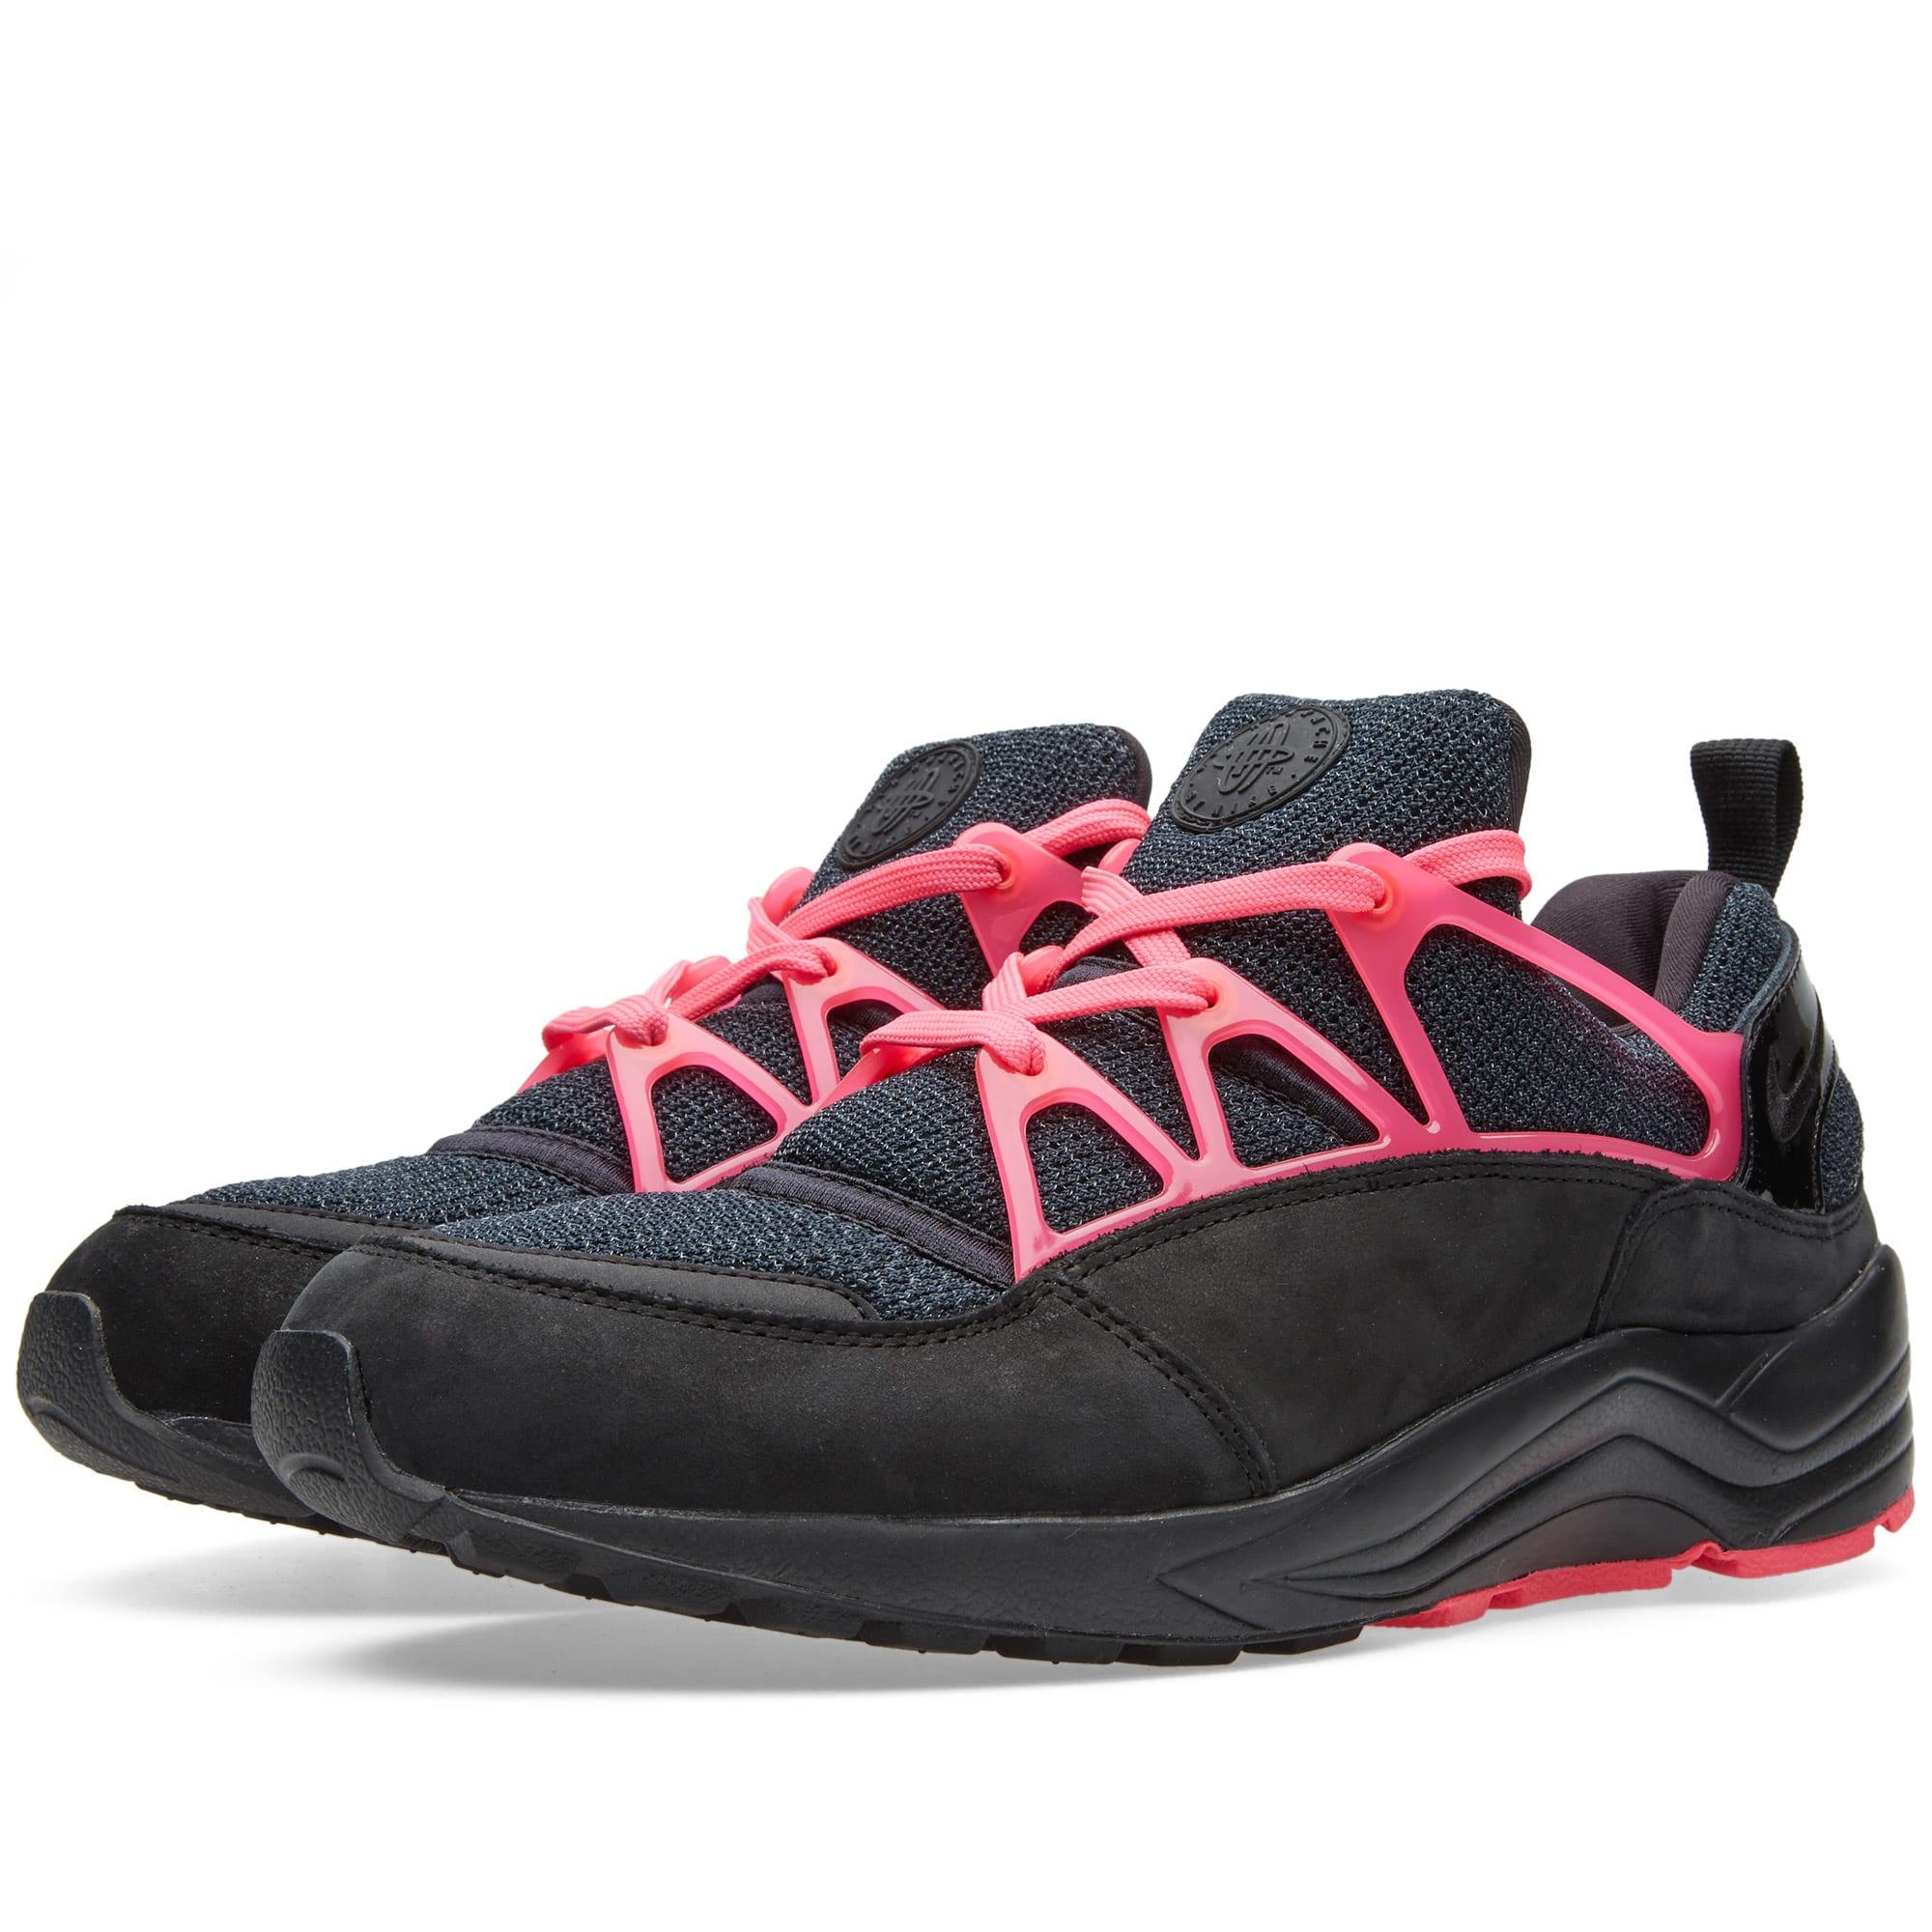 timeless design 580e6 92d27 Nike Air Huarache Light FC Black   Pink Flash   END.